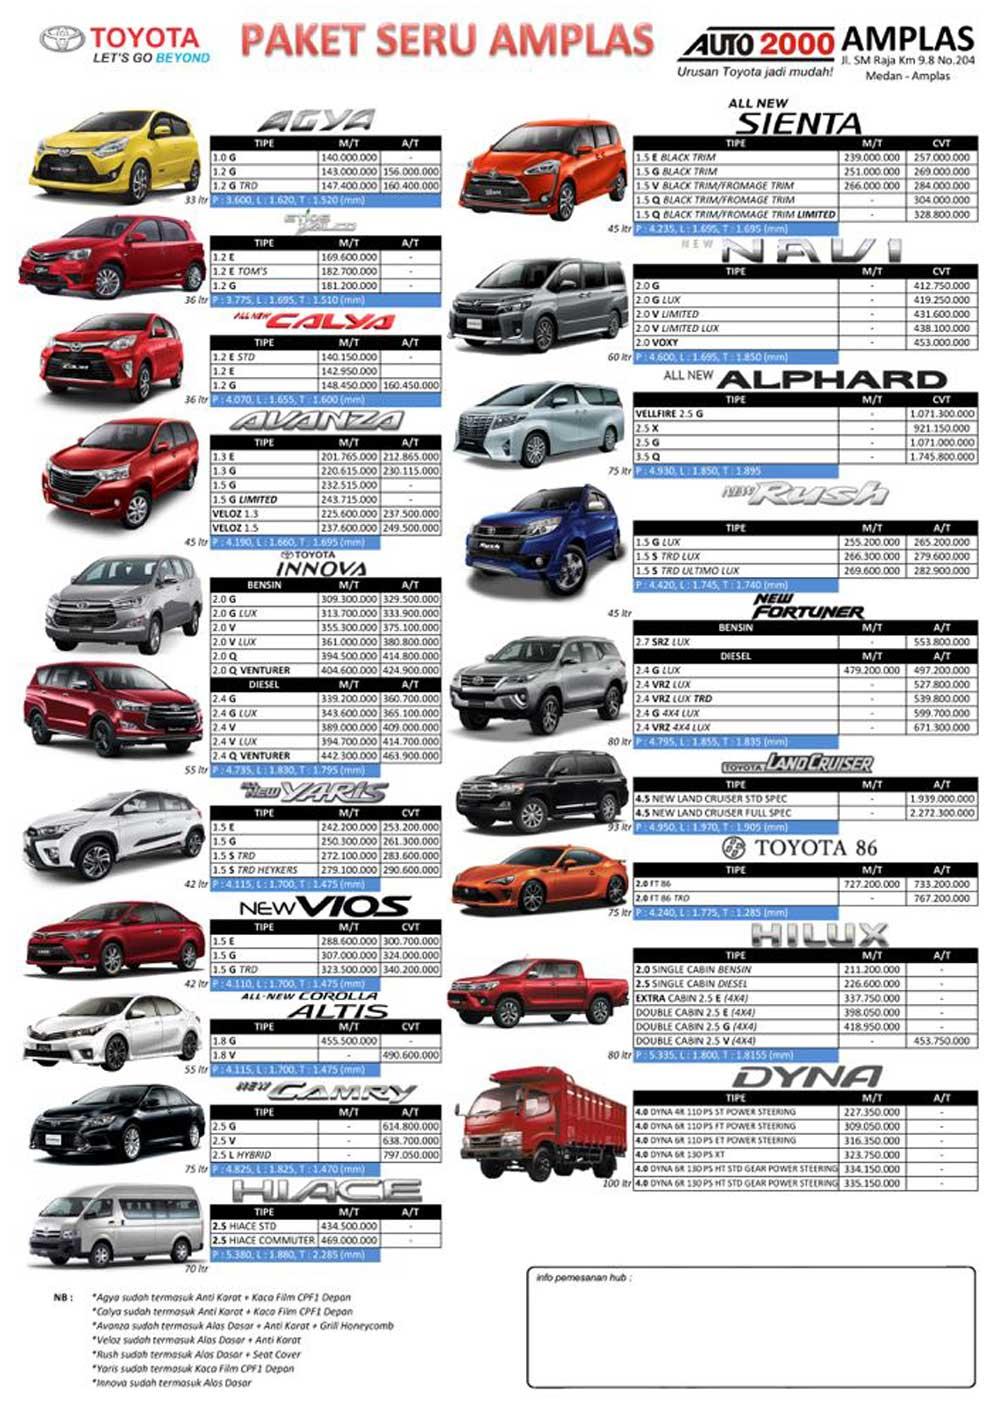 Kelebihan Kekurangan Daftar Harga Toyota Top Model Tahun Ini